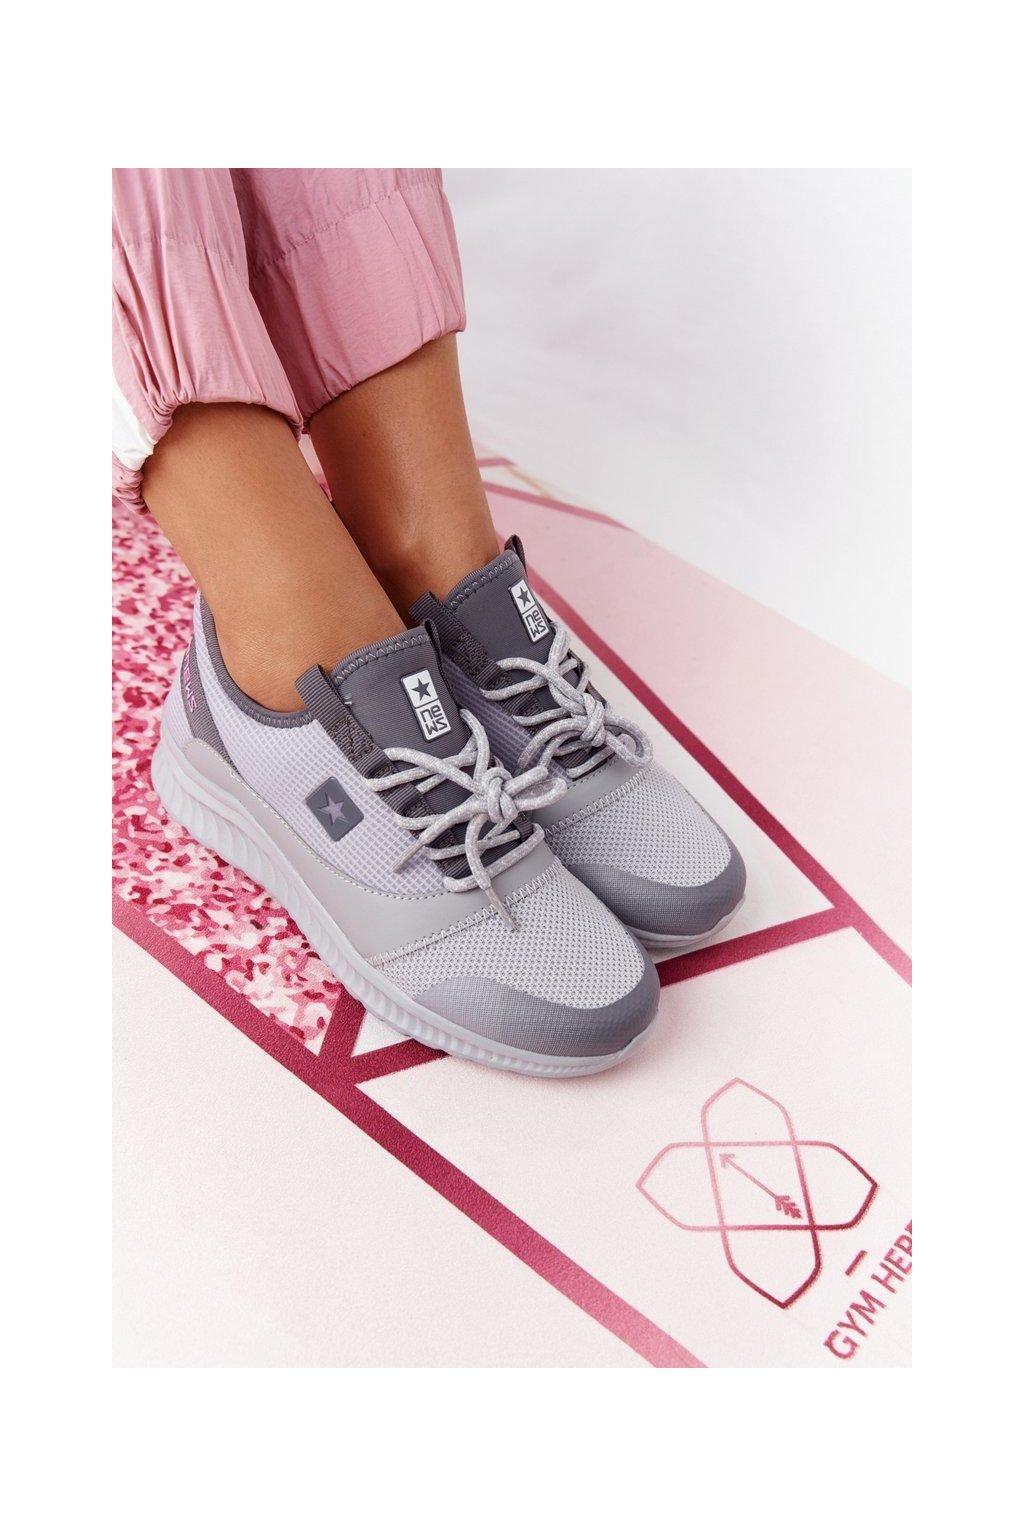 Dámske tenisky farba sivá kód obuvi 21SP37-3560 LT.GREY